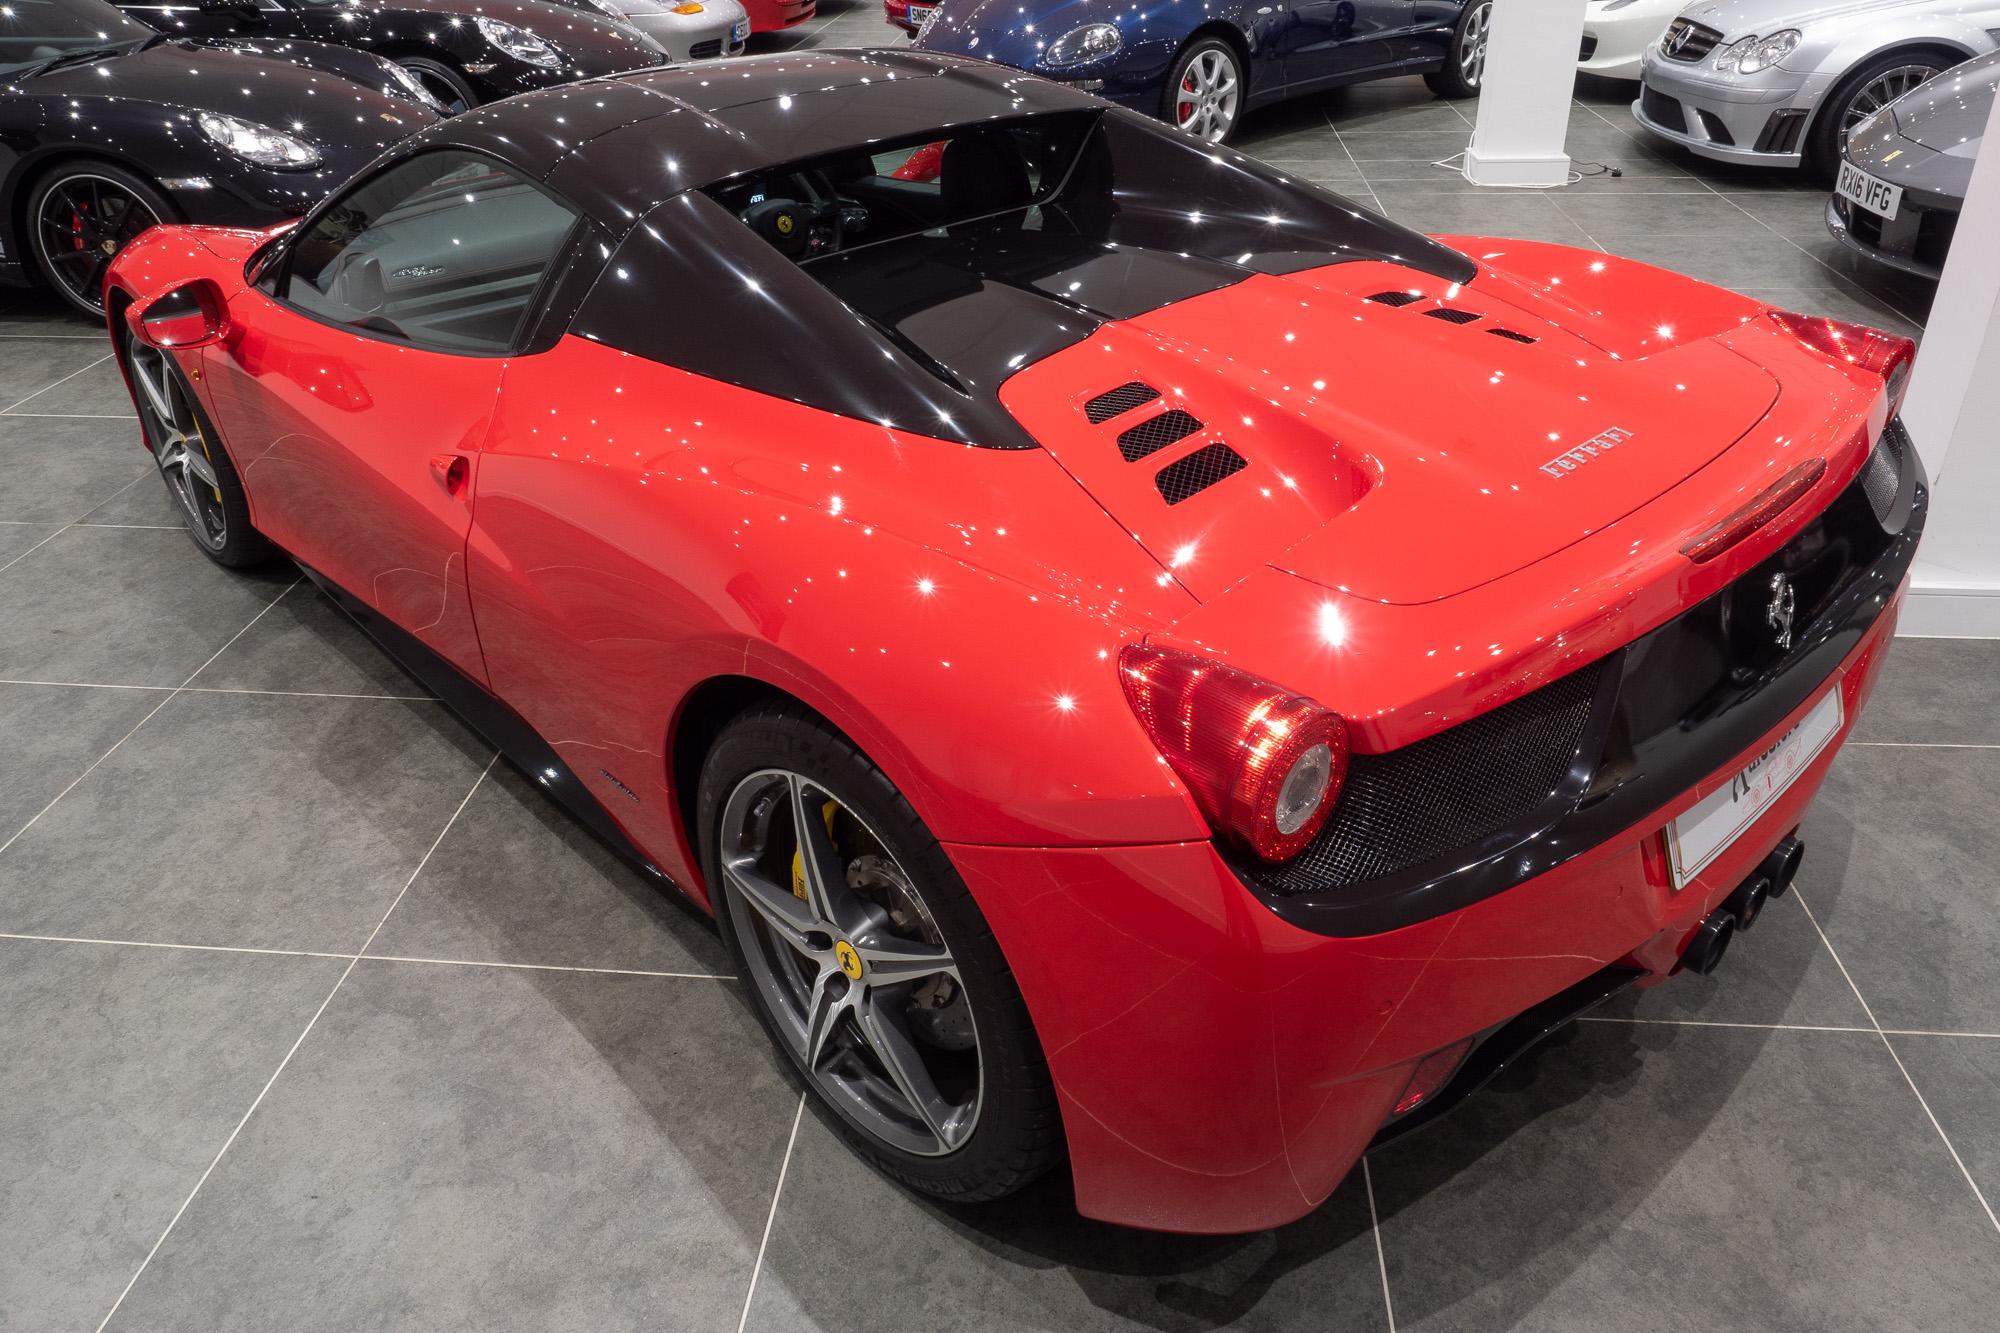 Wish Galactictechtips Xyz الصور والأفكار حول 2020 Ferrari 458 Spider Black